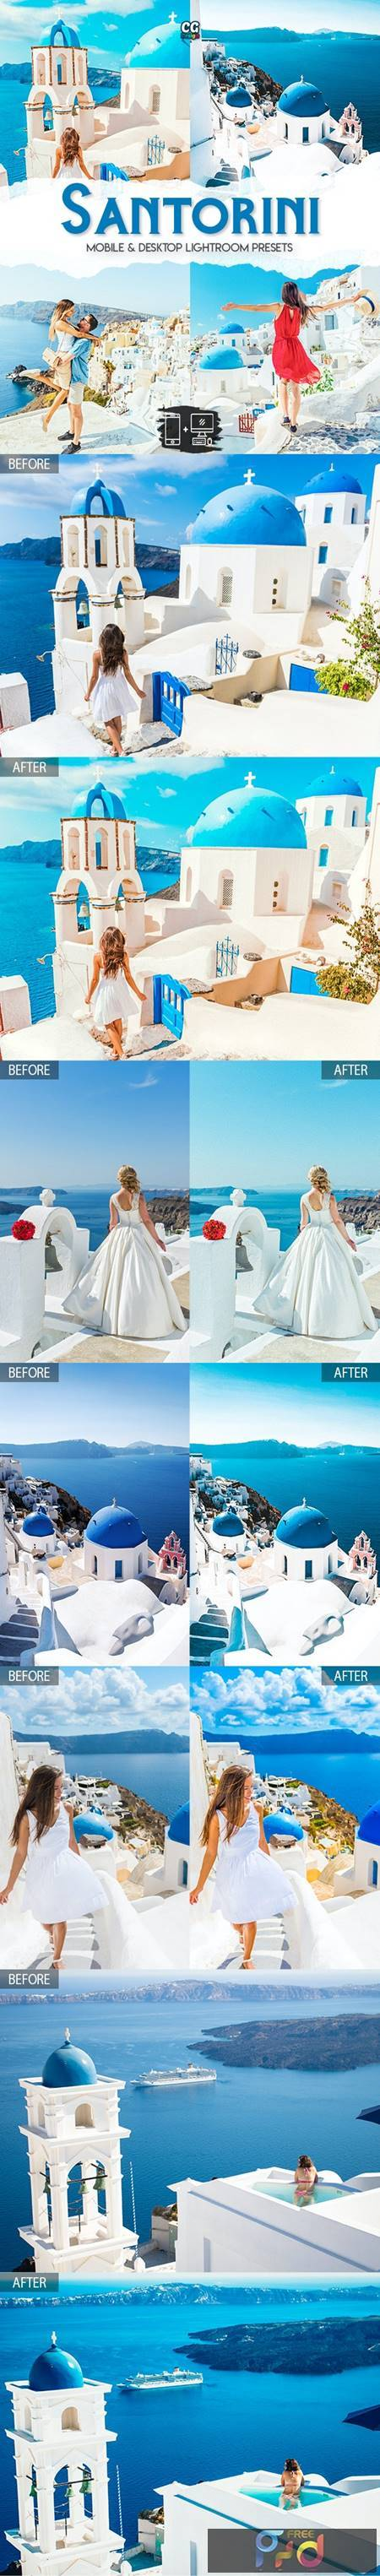 Santorini - 15 Premium Lightroom Presets 27933164 1